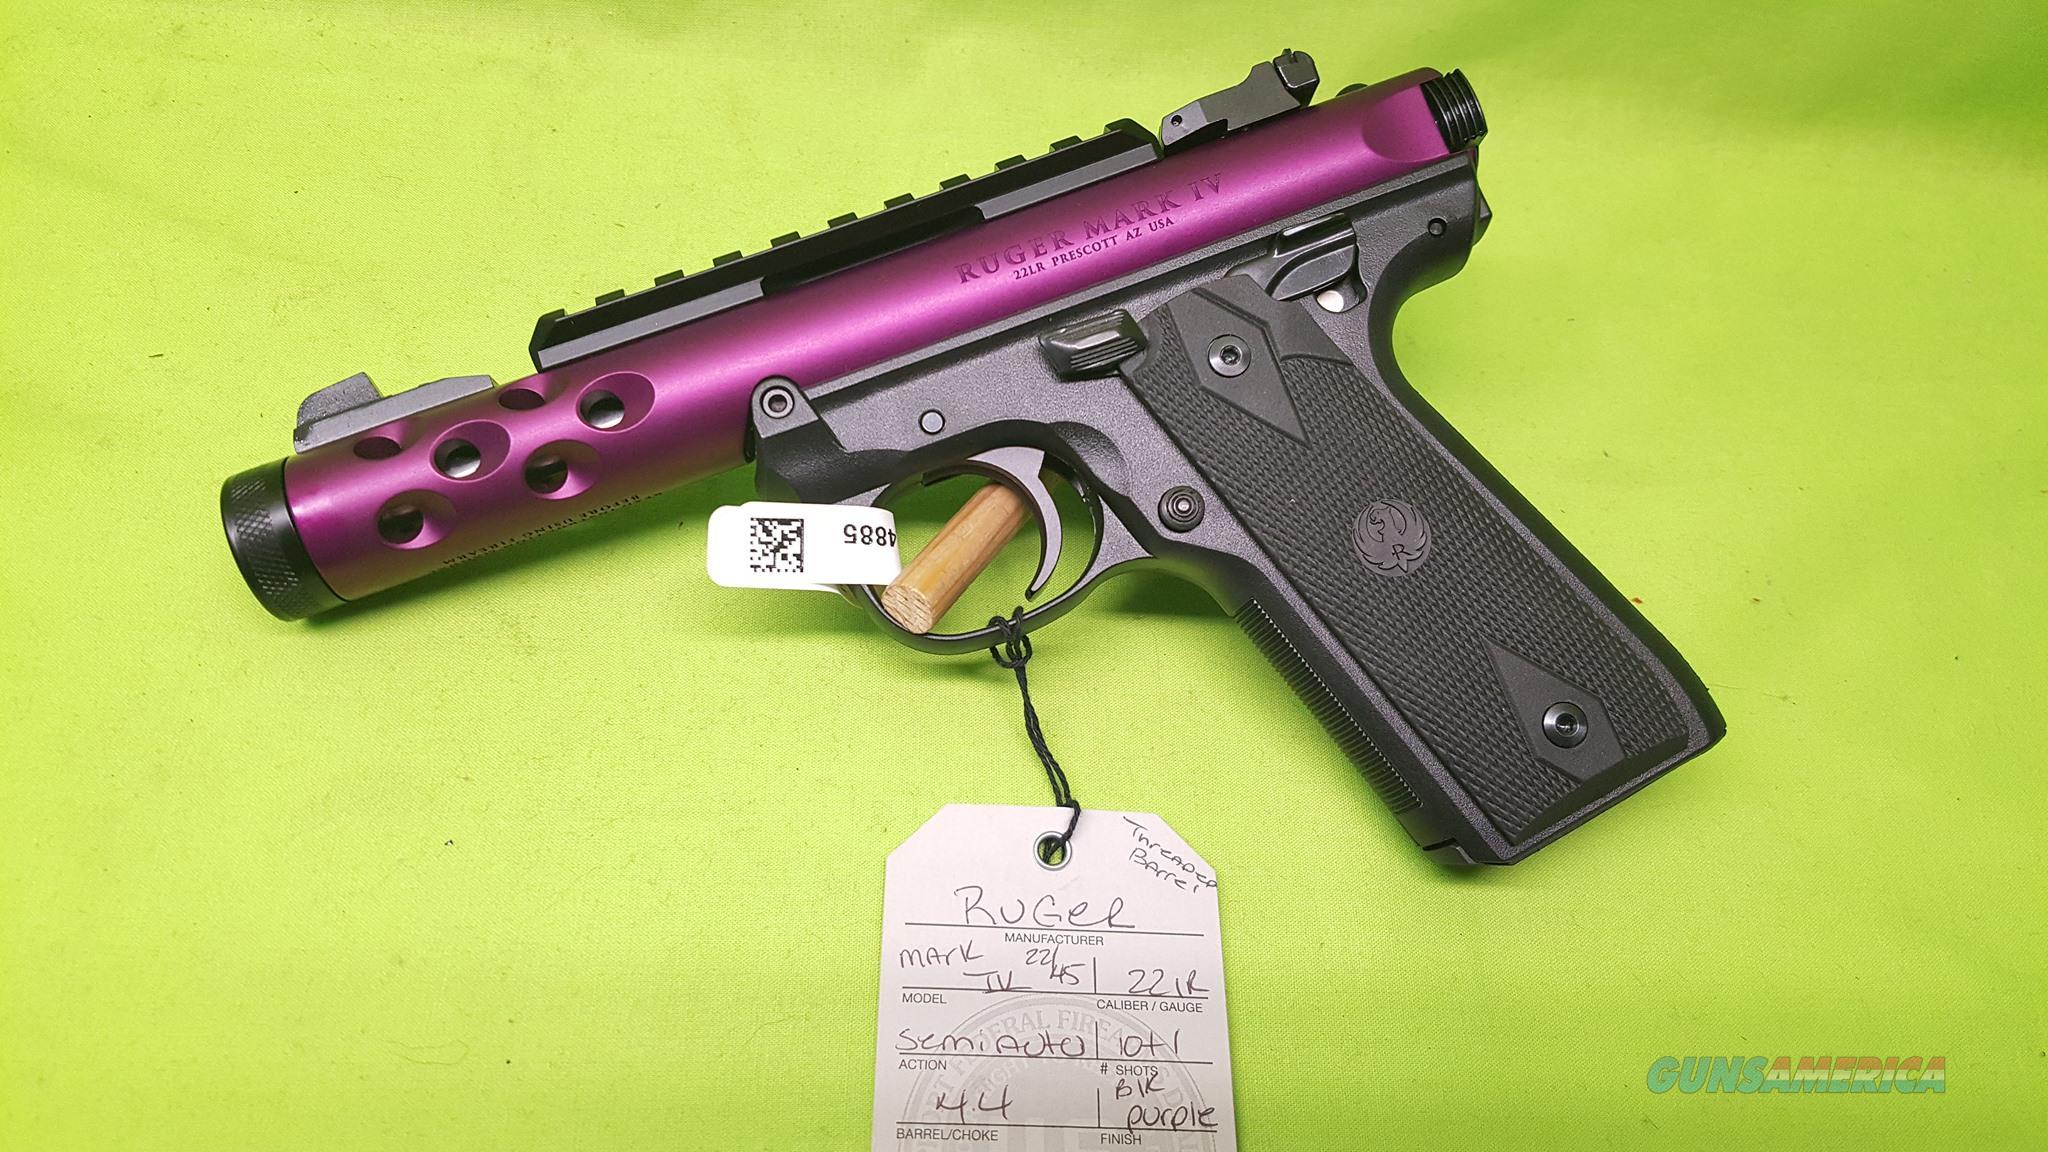 RUGER MARK IV 22 45 22/45 LITE 22LR PURPLE 43915   Guns > Pistols > Ruger Semi-Auto Pistols > 22/45